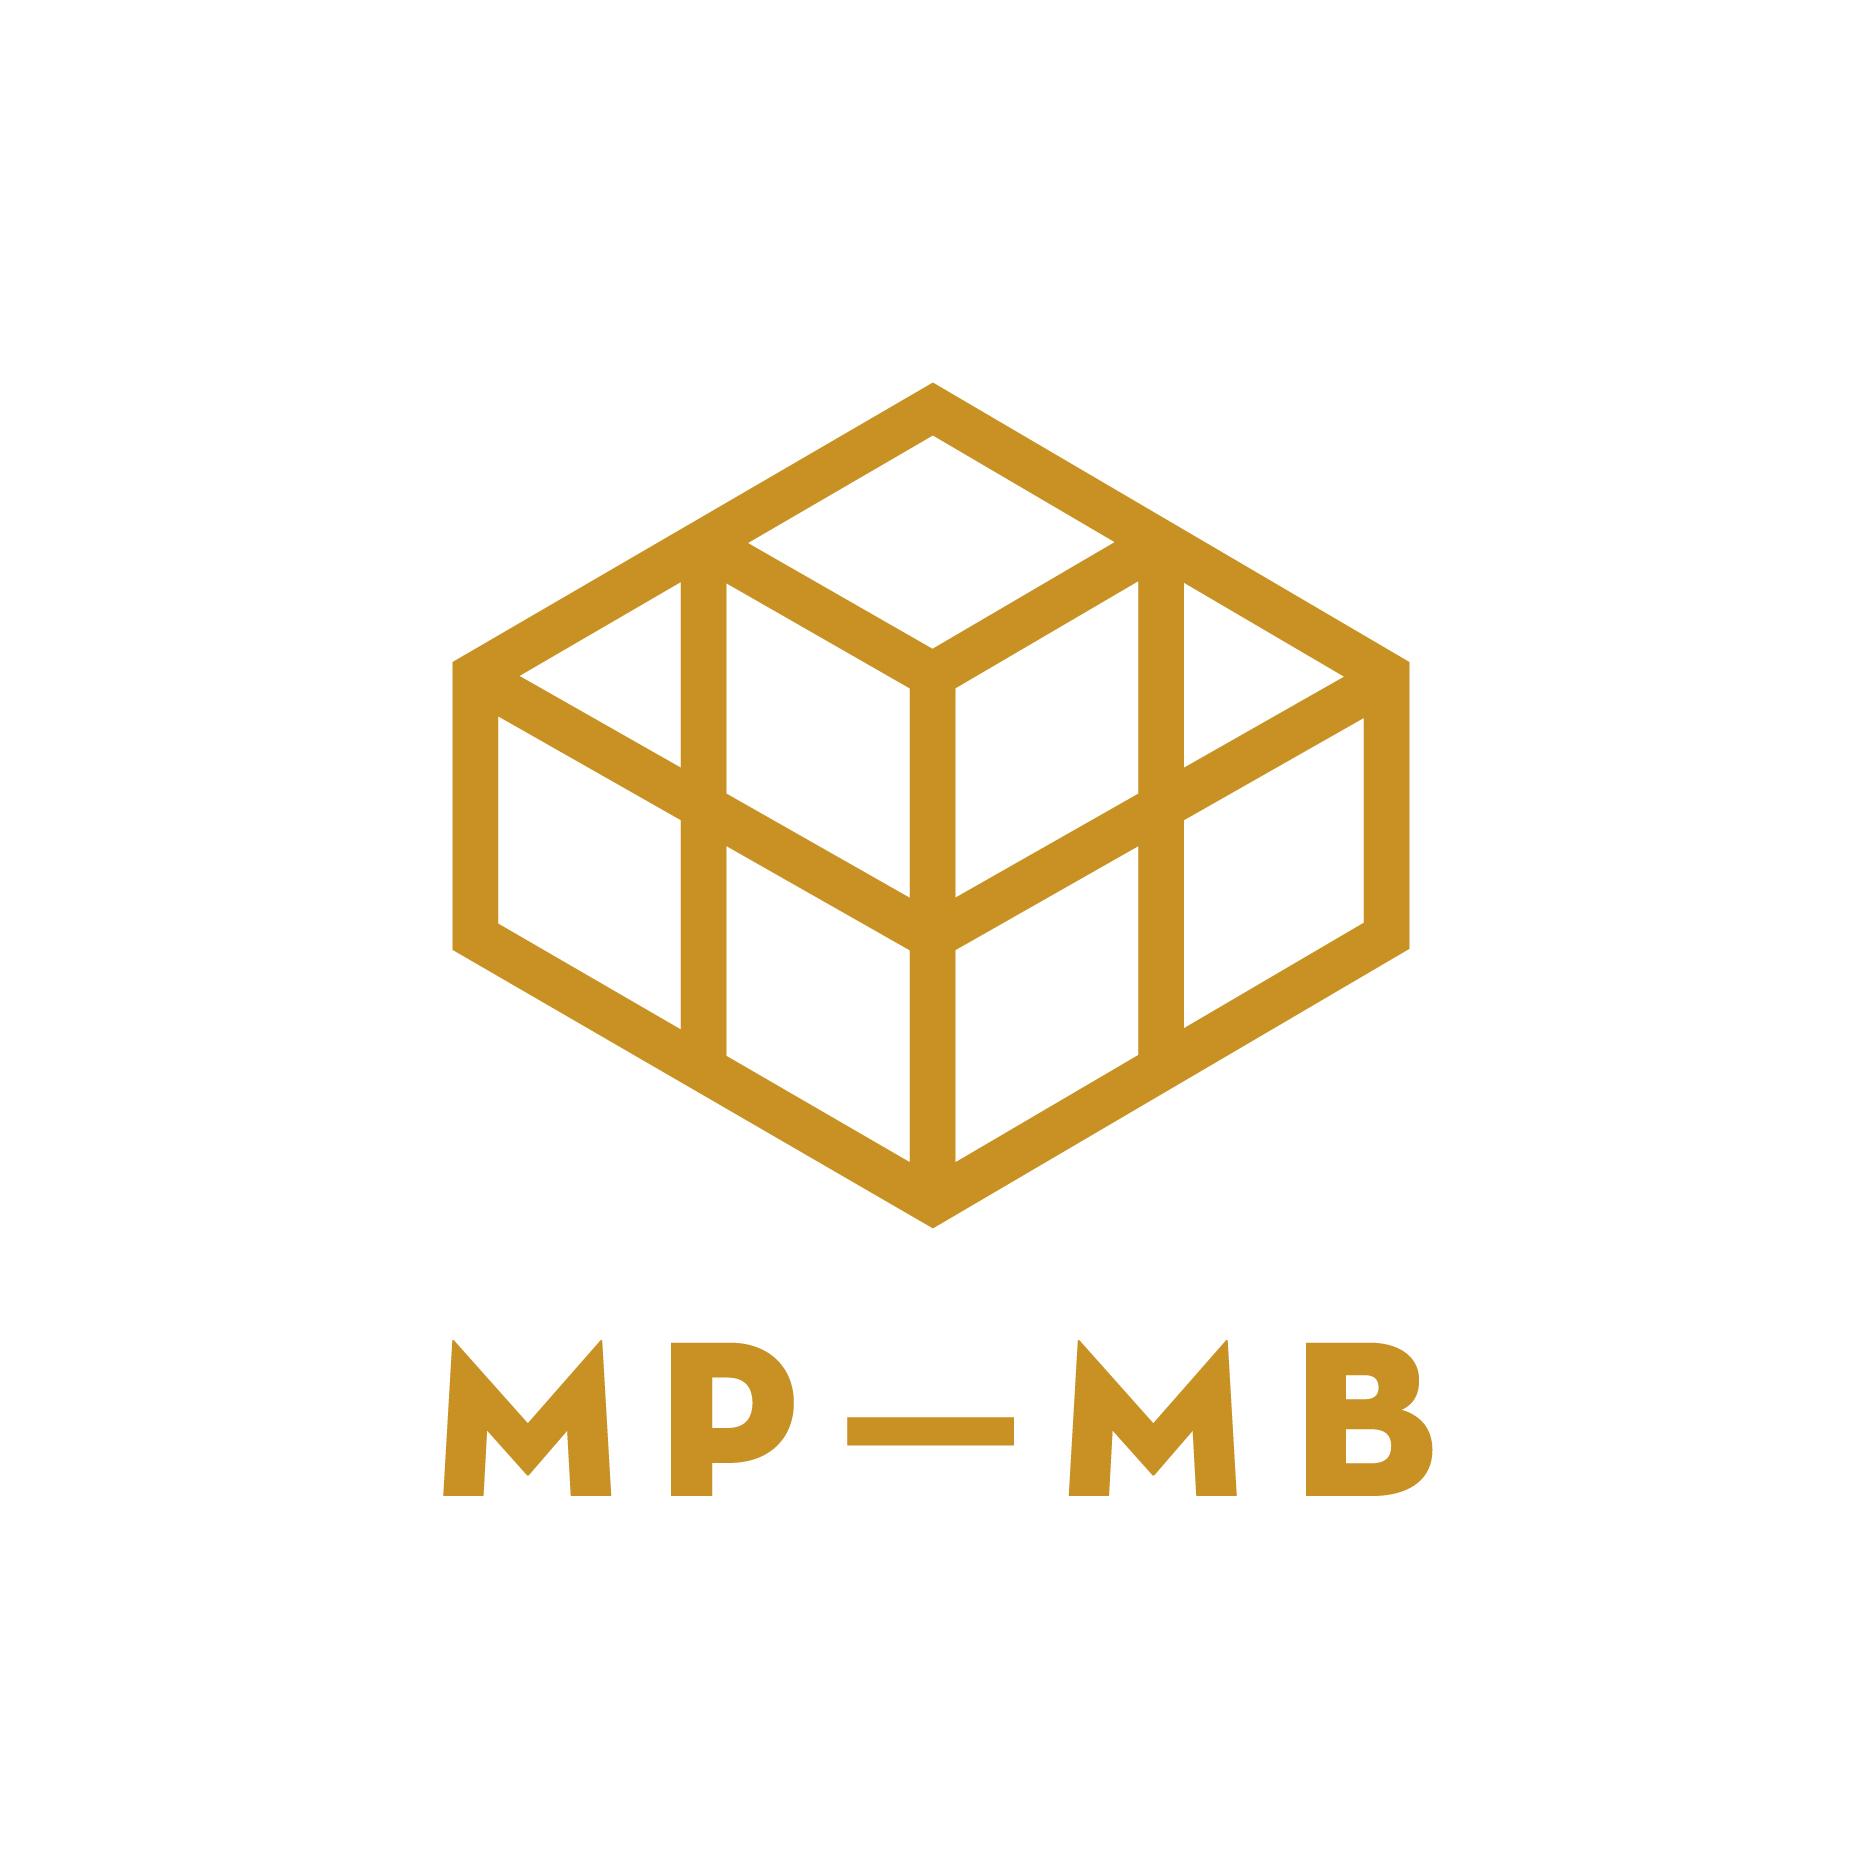 mpmb logo design by logo designer Mazaki Studio